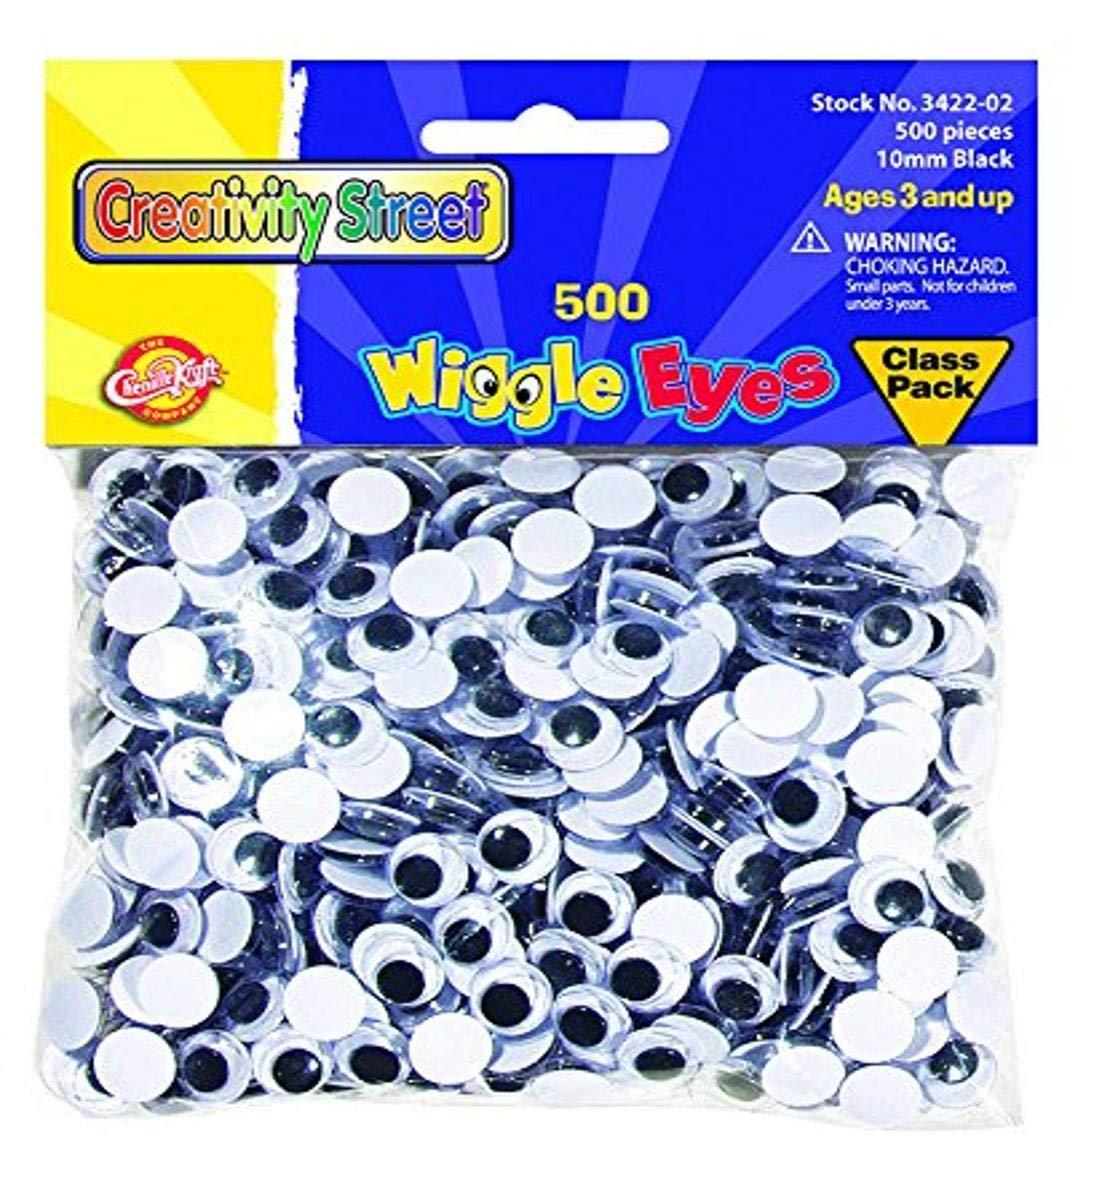 Amazon Com Creativity Street Wiggle Eyes Classpack Black 10mm Pack Of 500 Industrial Scientific